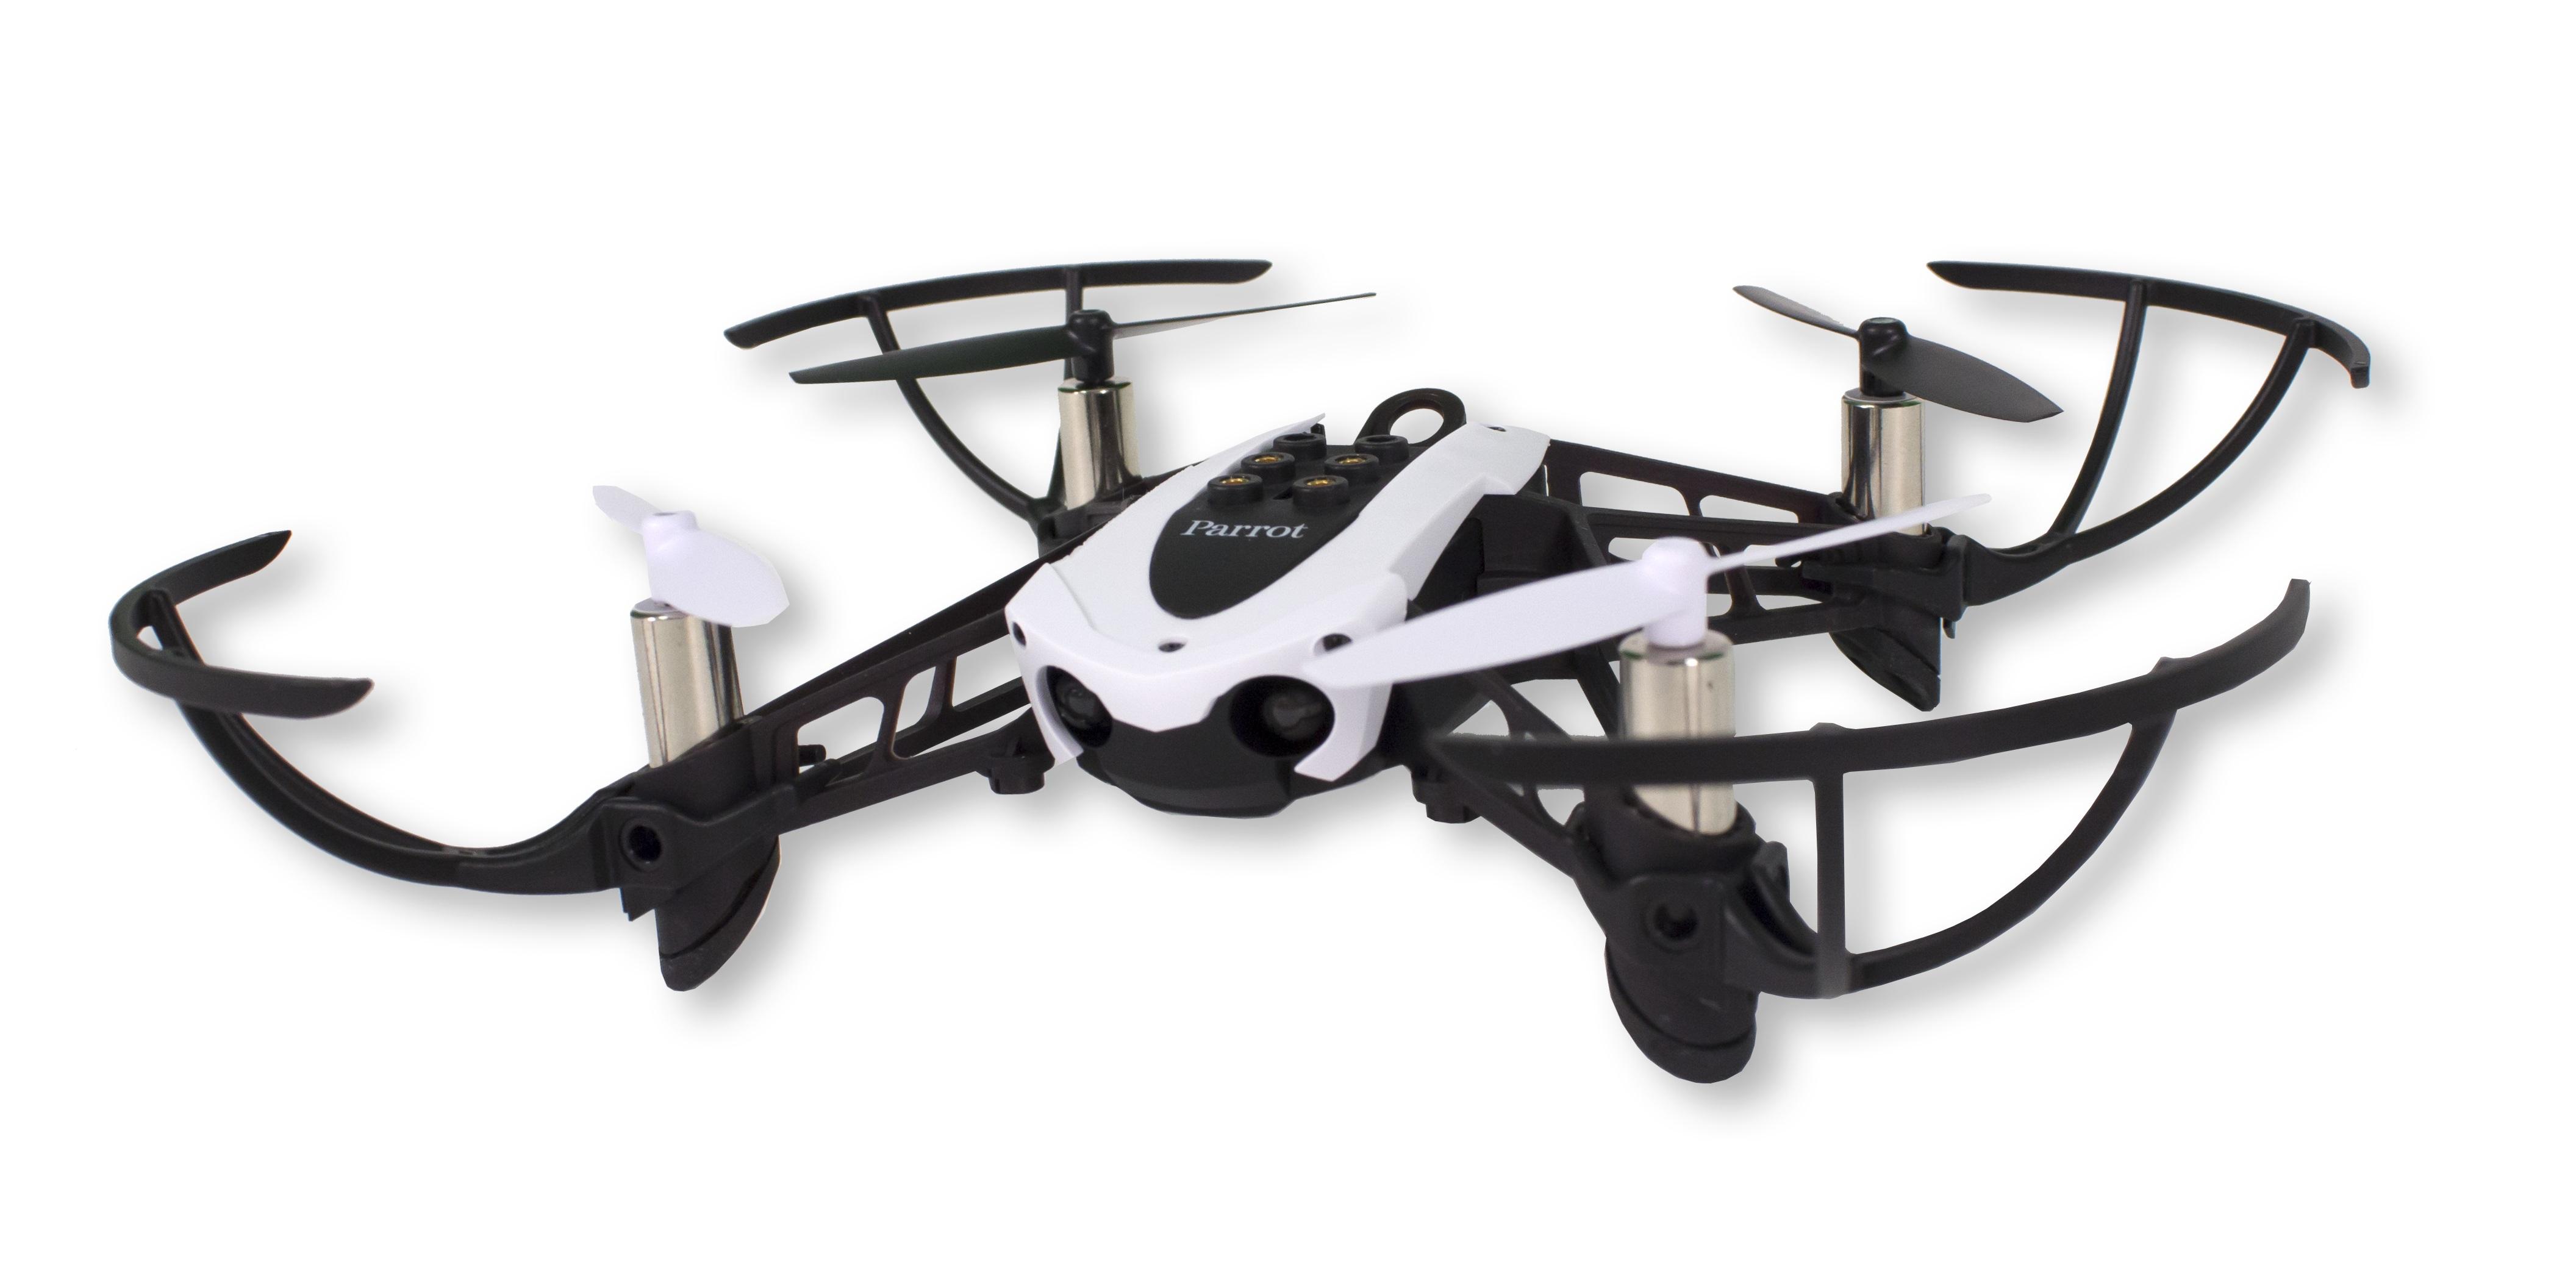 Ar Drone Simulink Development Kit V1 1 - Best Photos Drone